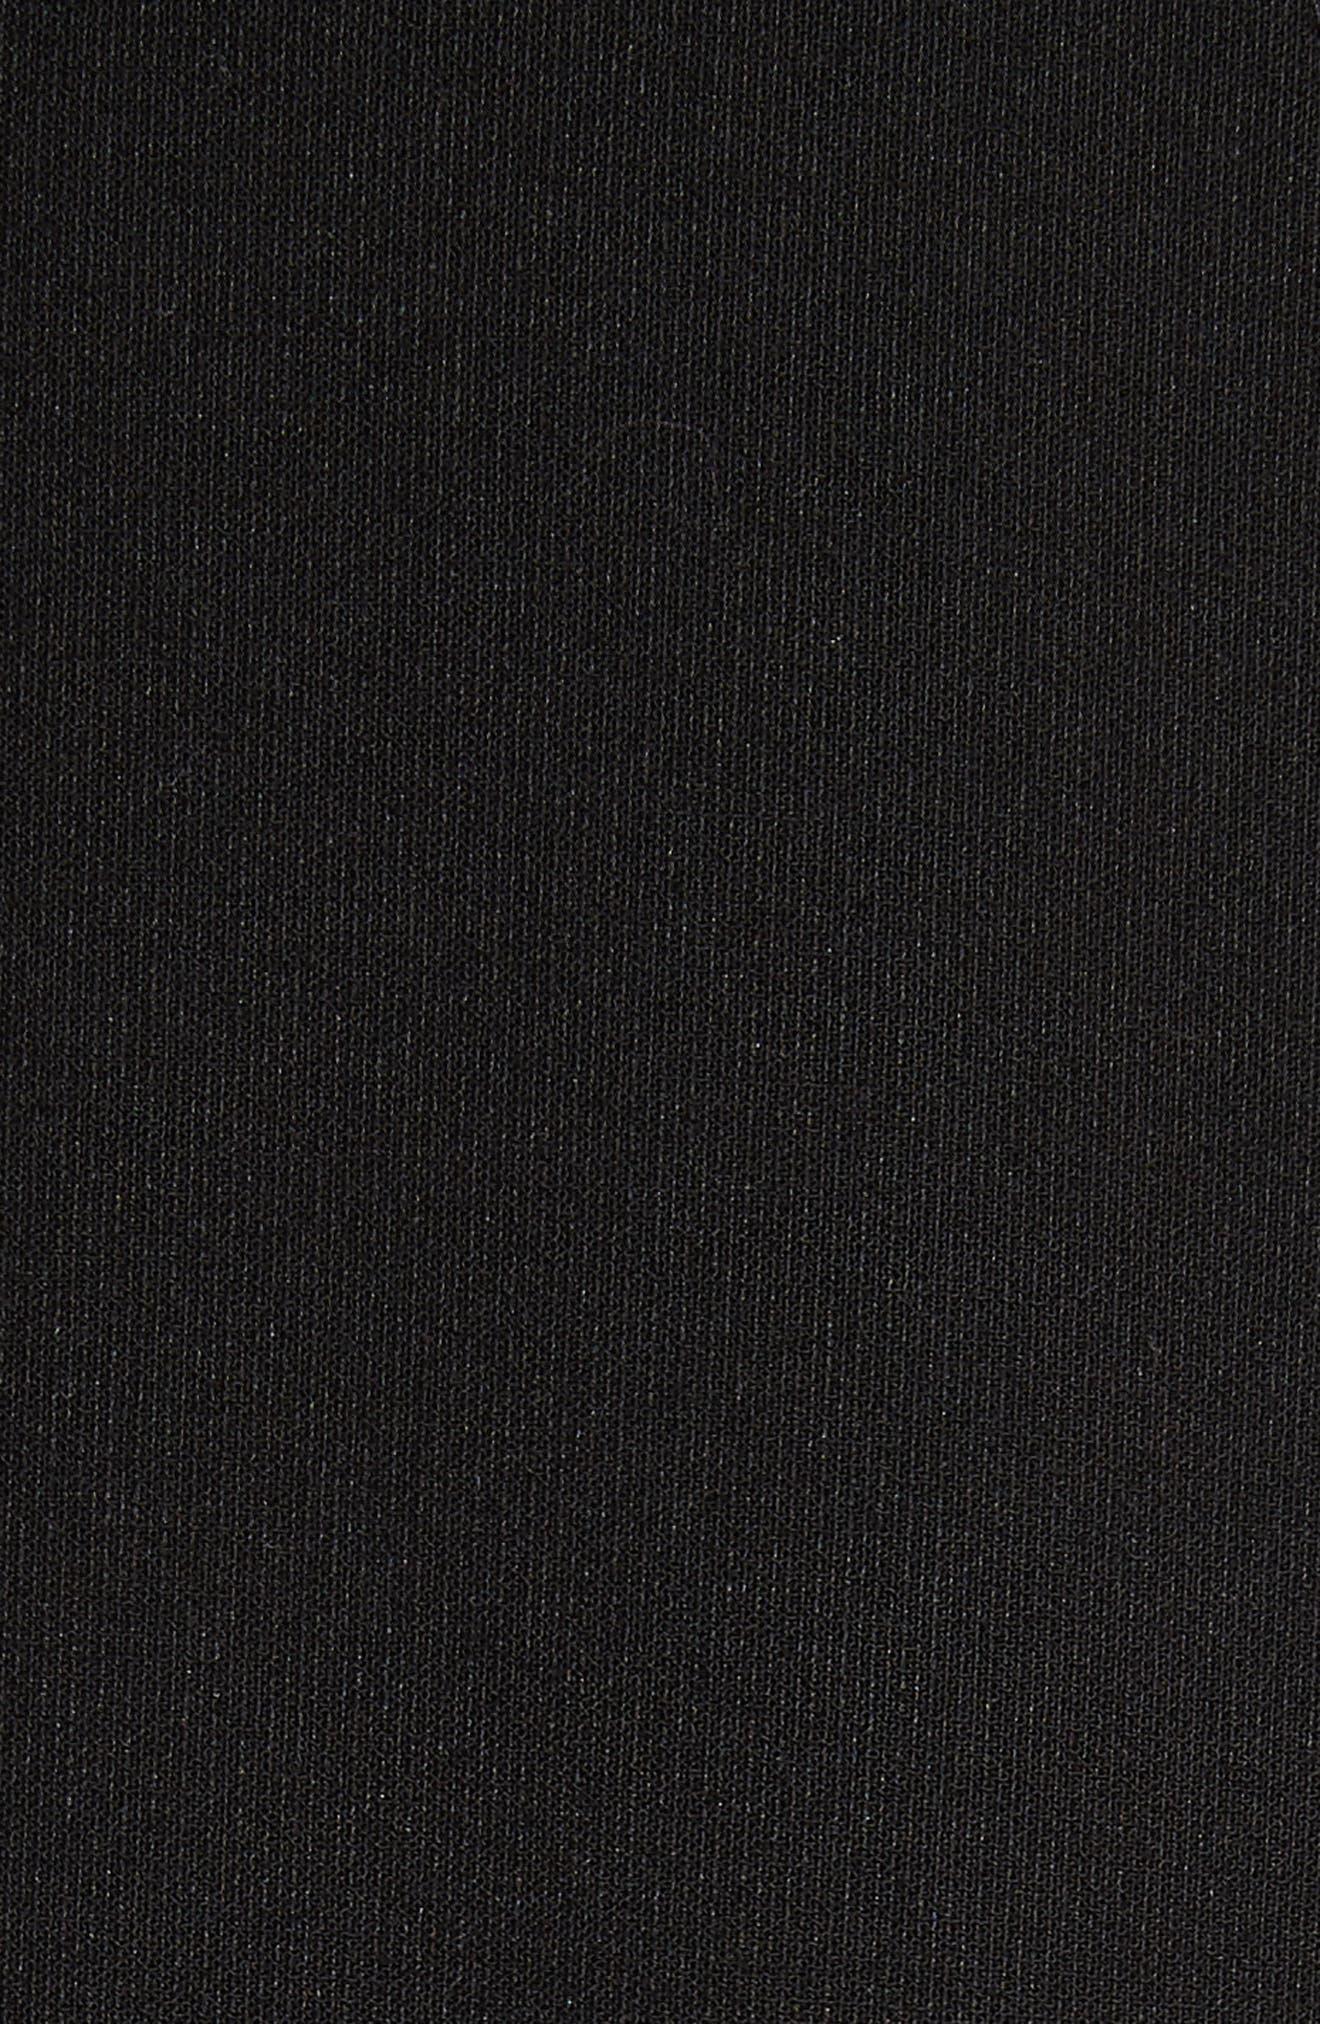 Lida Sheath Dress,                             Alternate thumbnail 9, color,